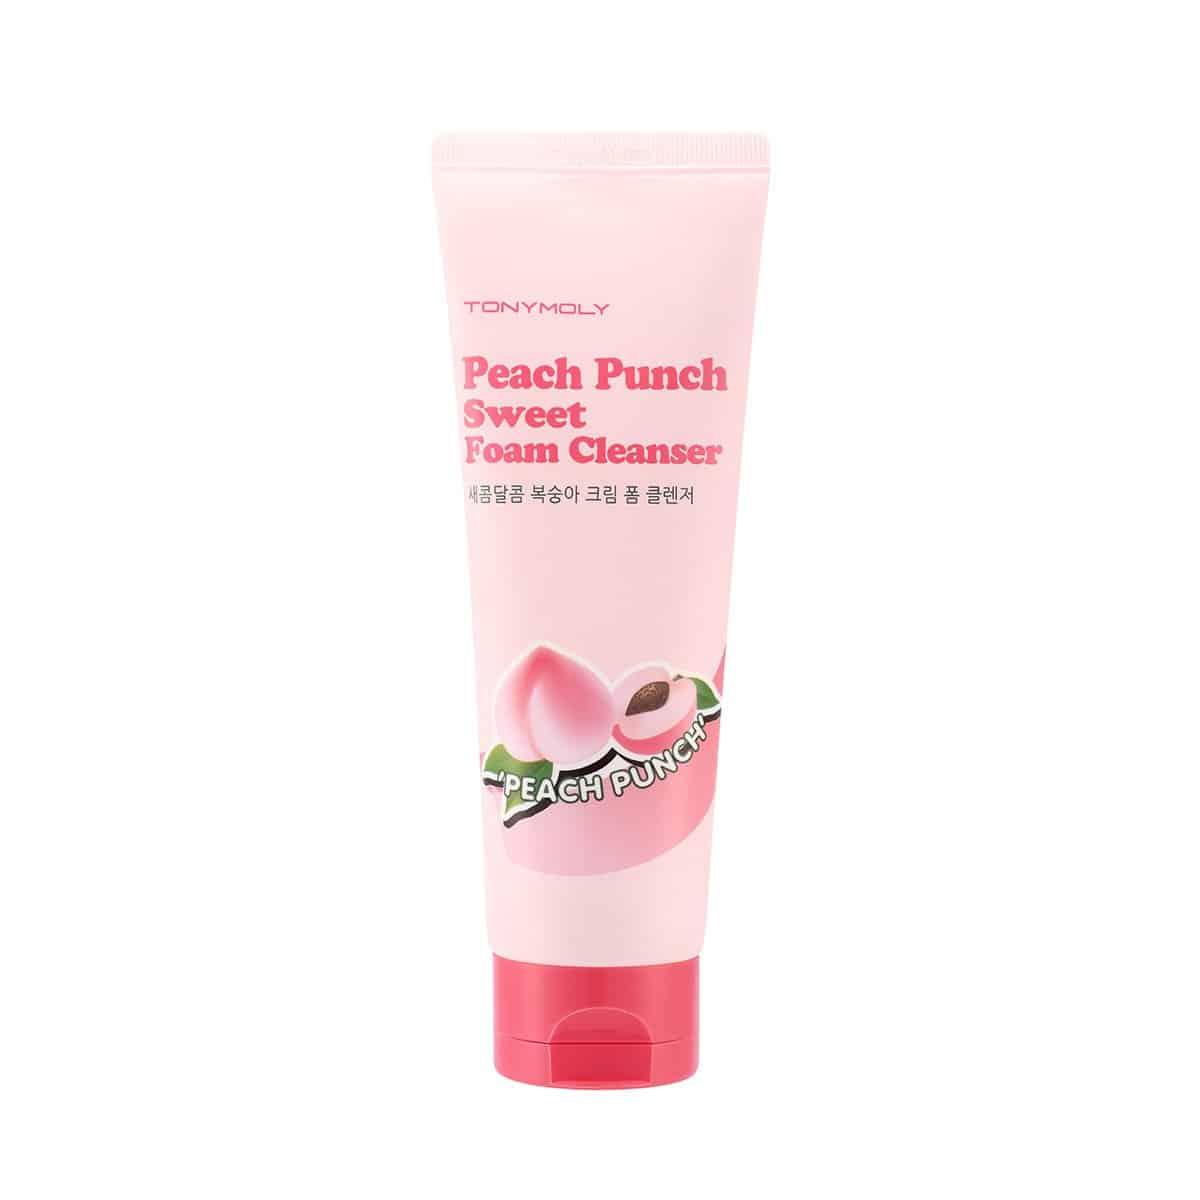 peach punch sweet foam cleanser tonymoly